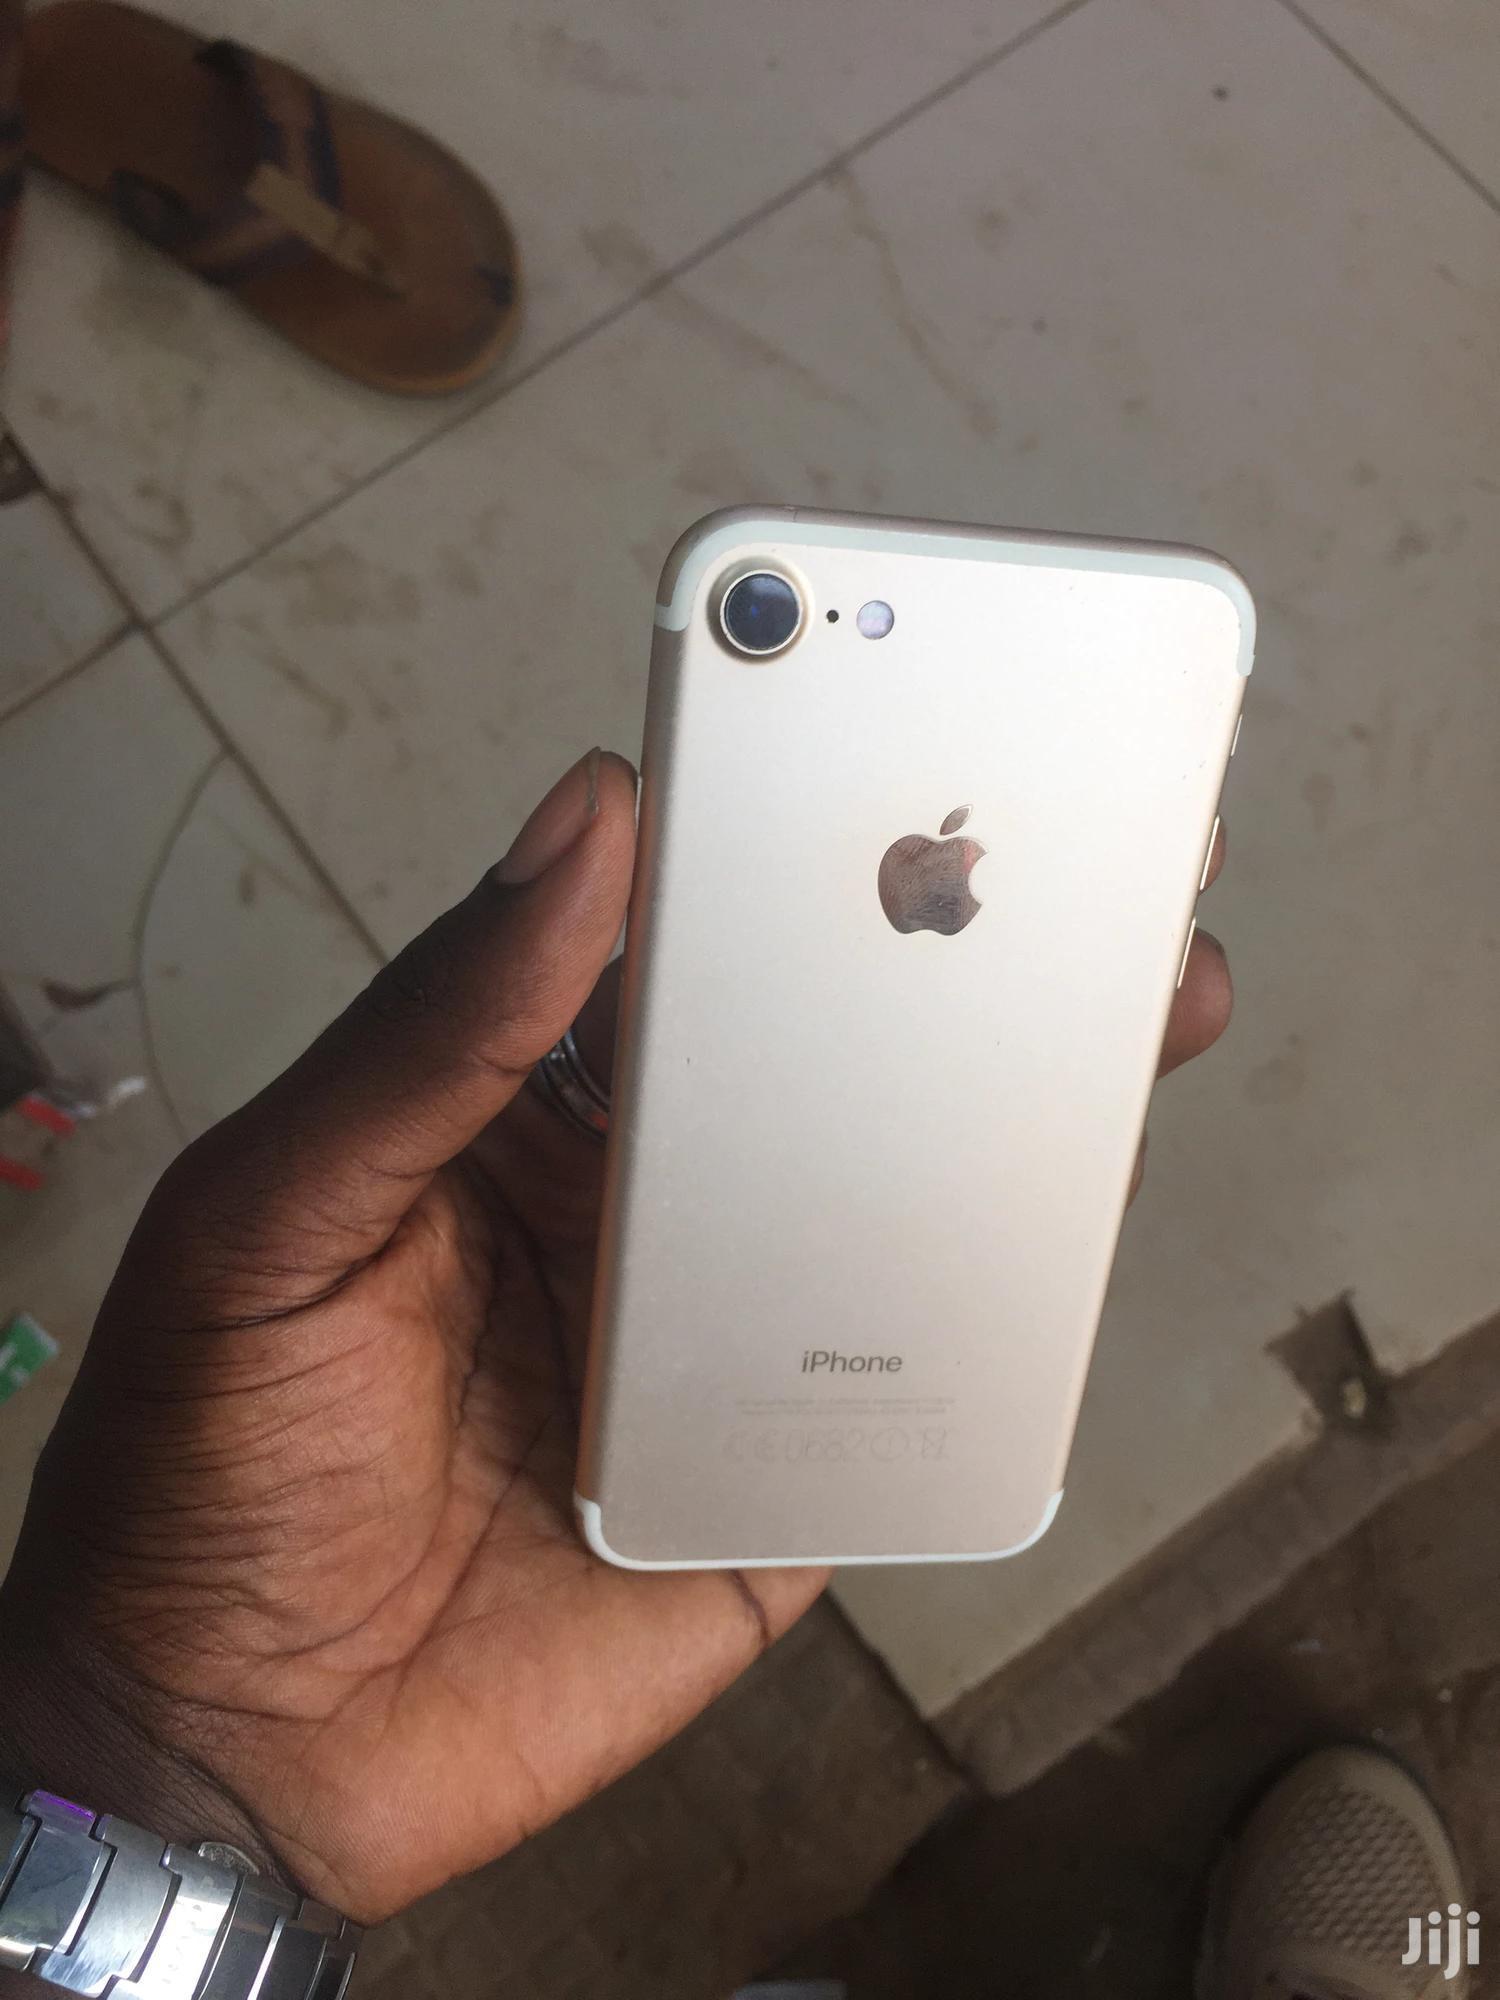 Apple iPhone 7 32 GB White | Mobile Phones for sale in Kampala, Central Region, Uganda